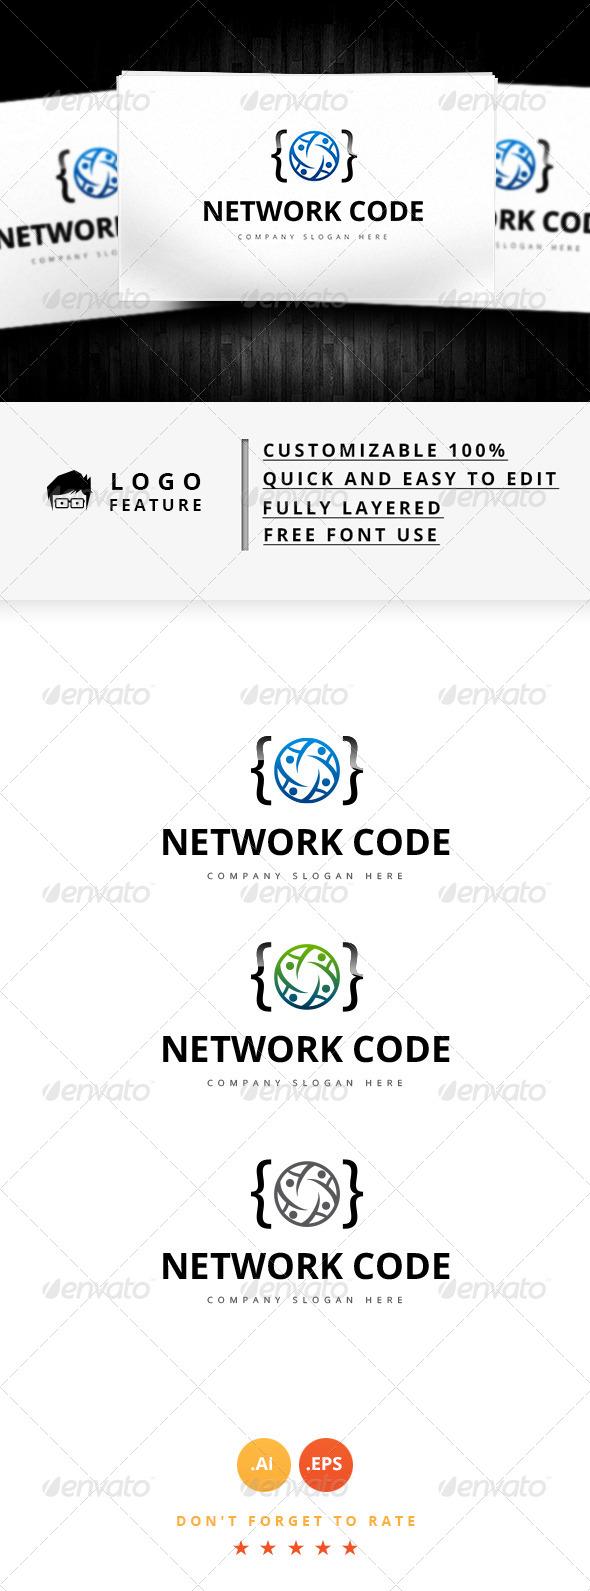 GraphicRiver Network Code Logo 8148238